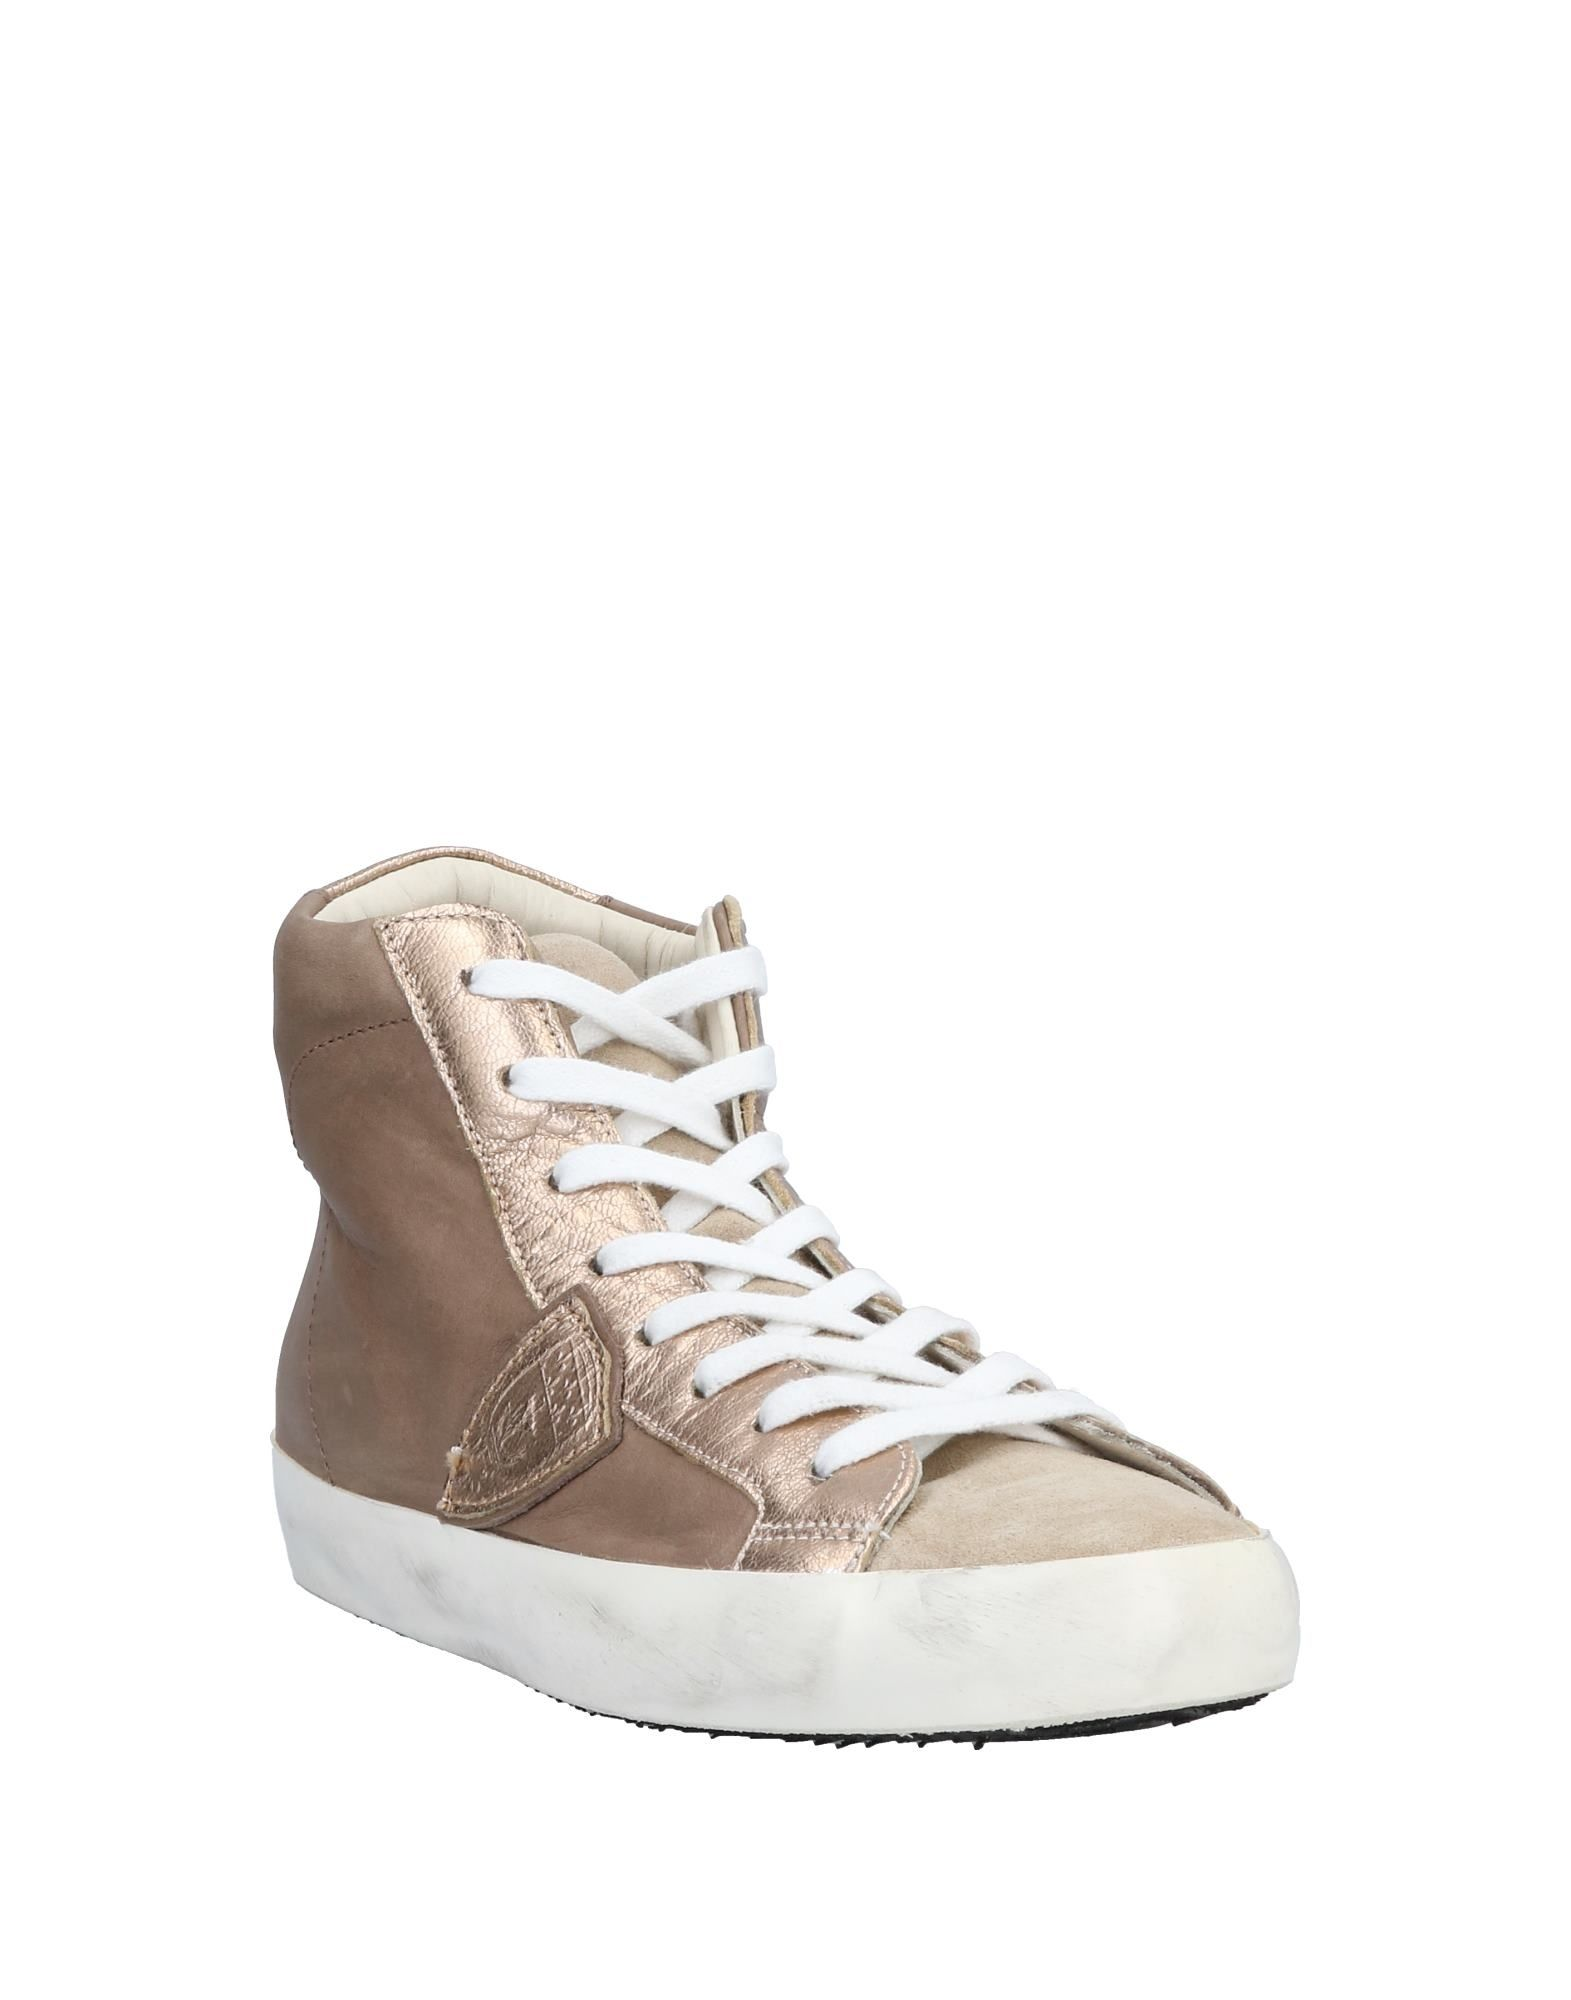 Philippe Model Sneakers Damen Schuhe  11567239GRGut aussehende strapazierfähige Schuhe Damen 276b88